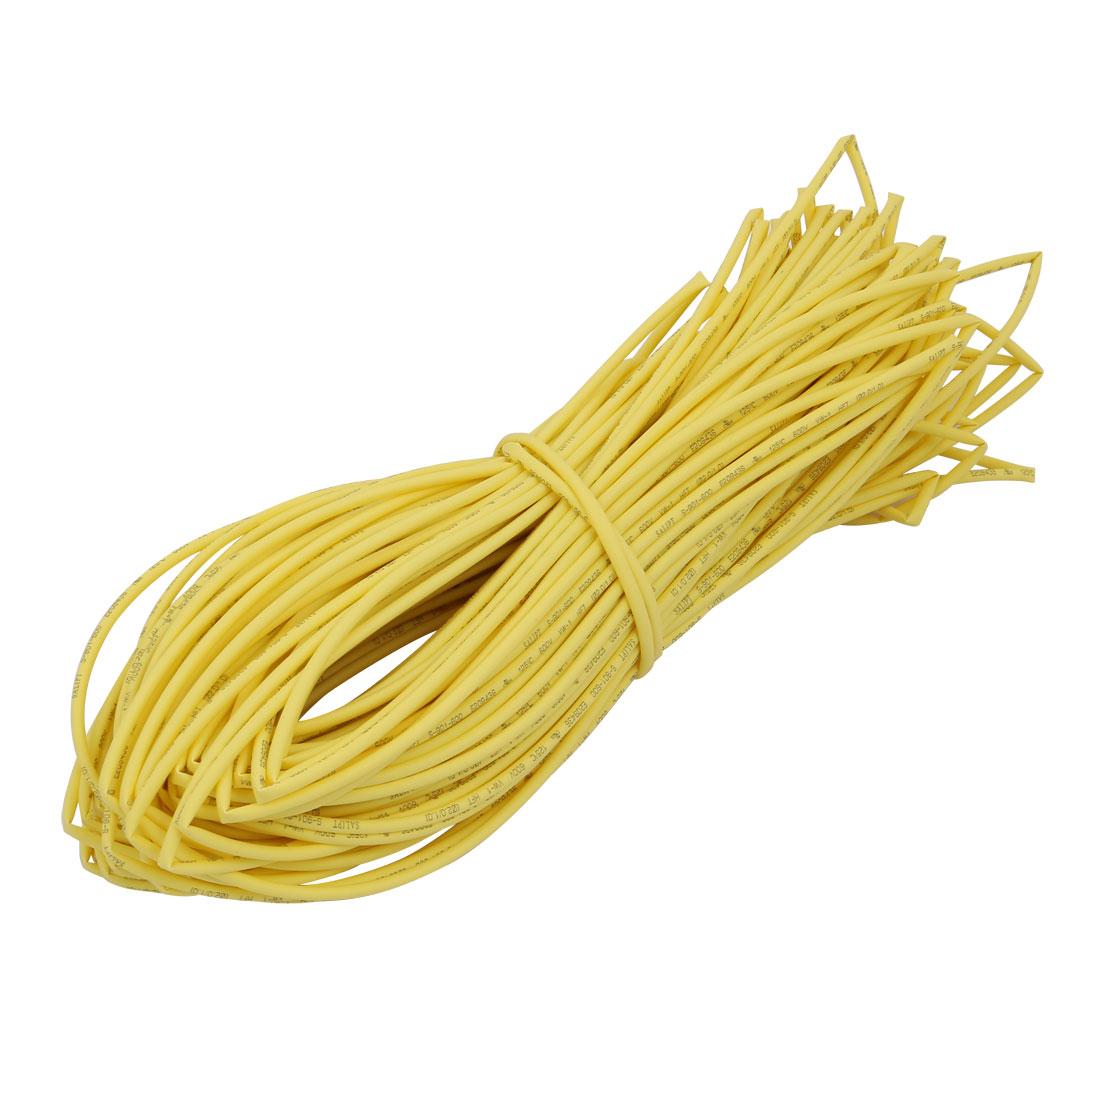 45M 0.08in Inner Dia Polyolefin Flame Retardant Tube Yellow for Wire Repairing